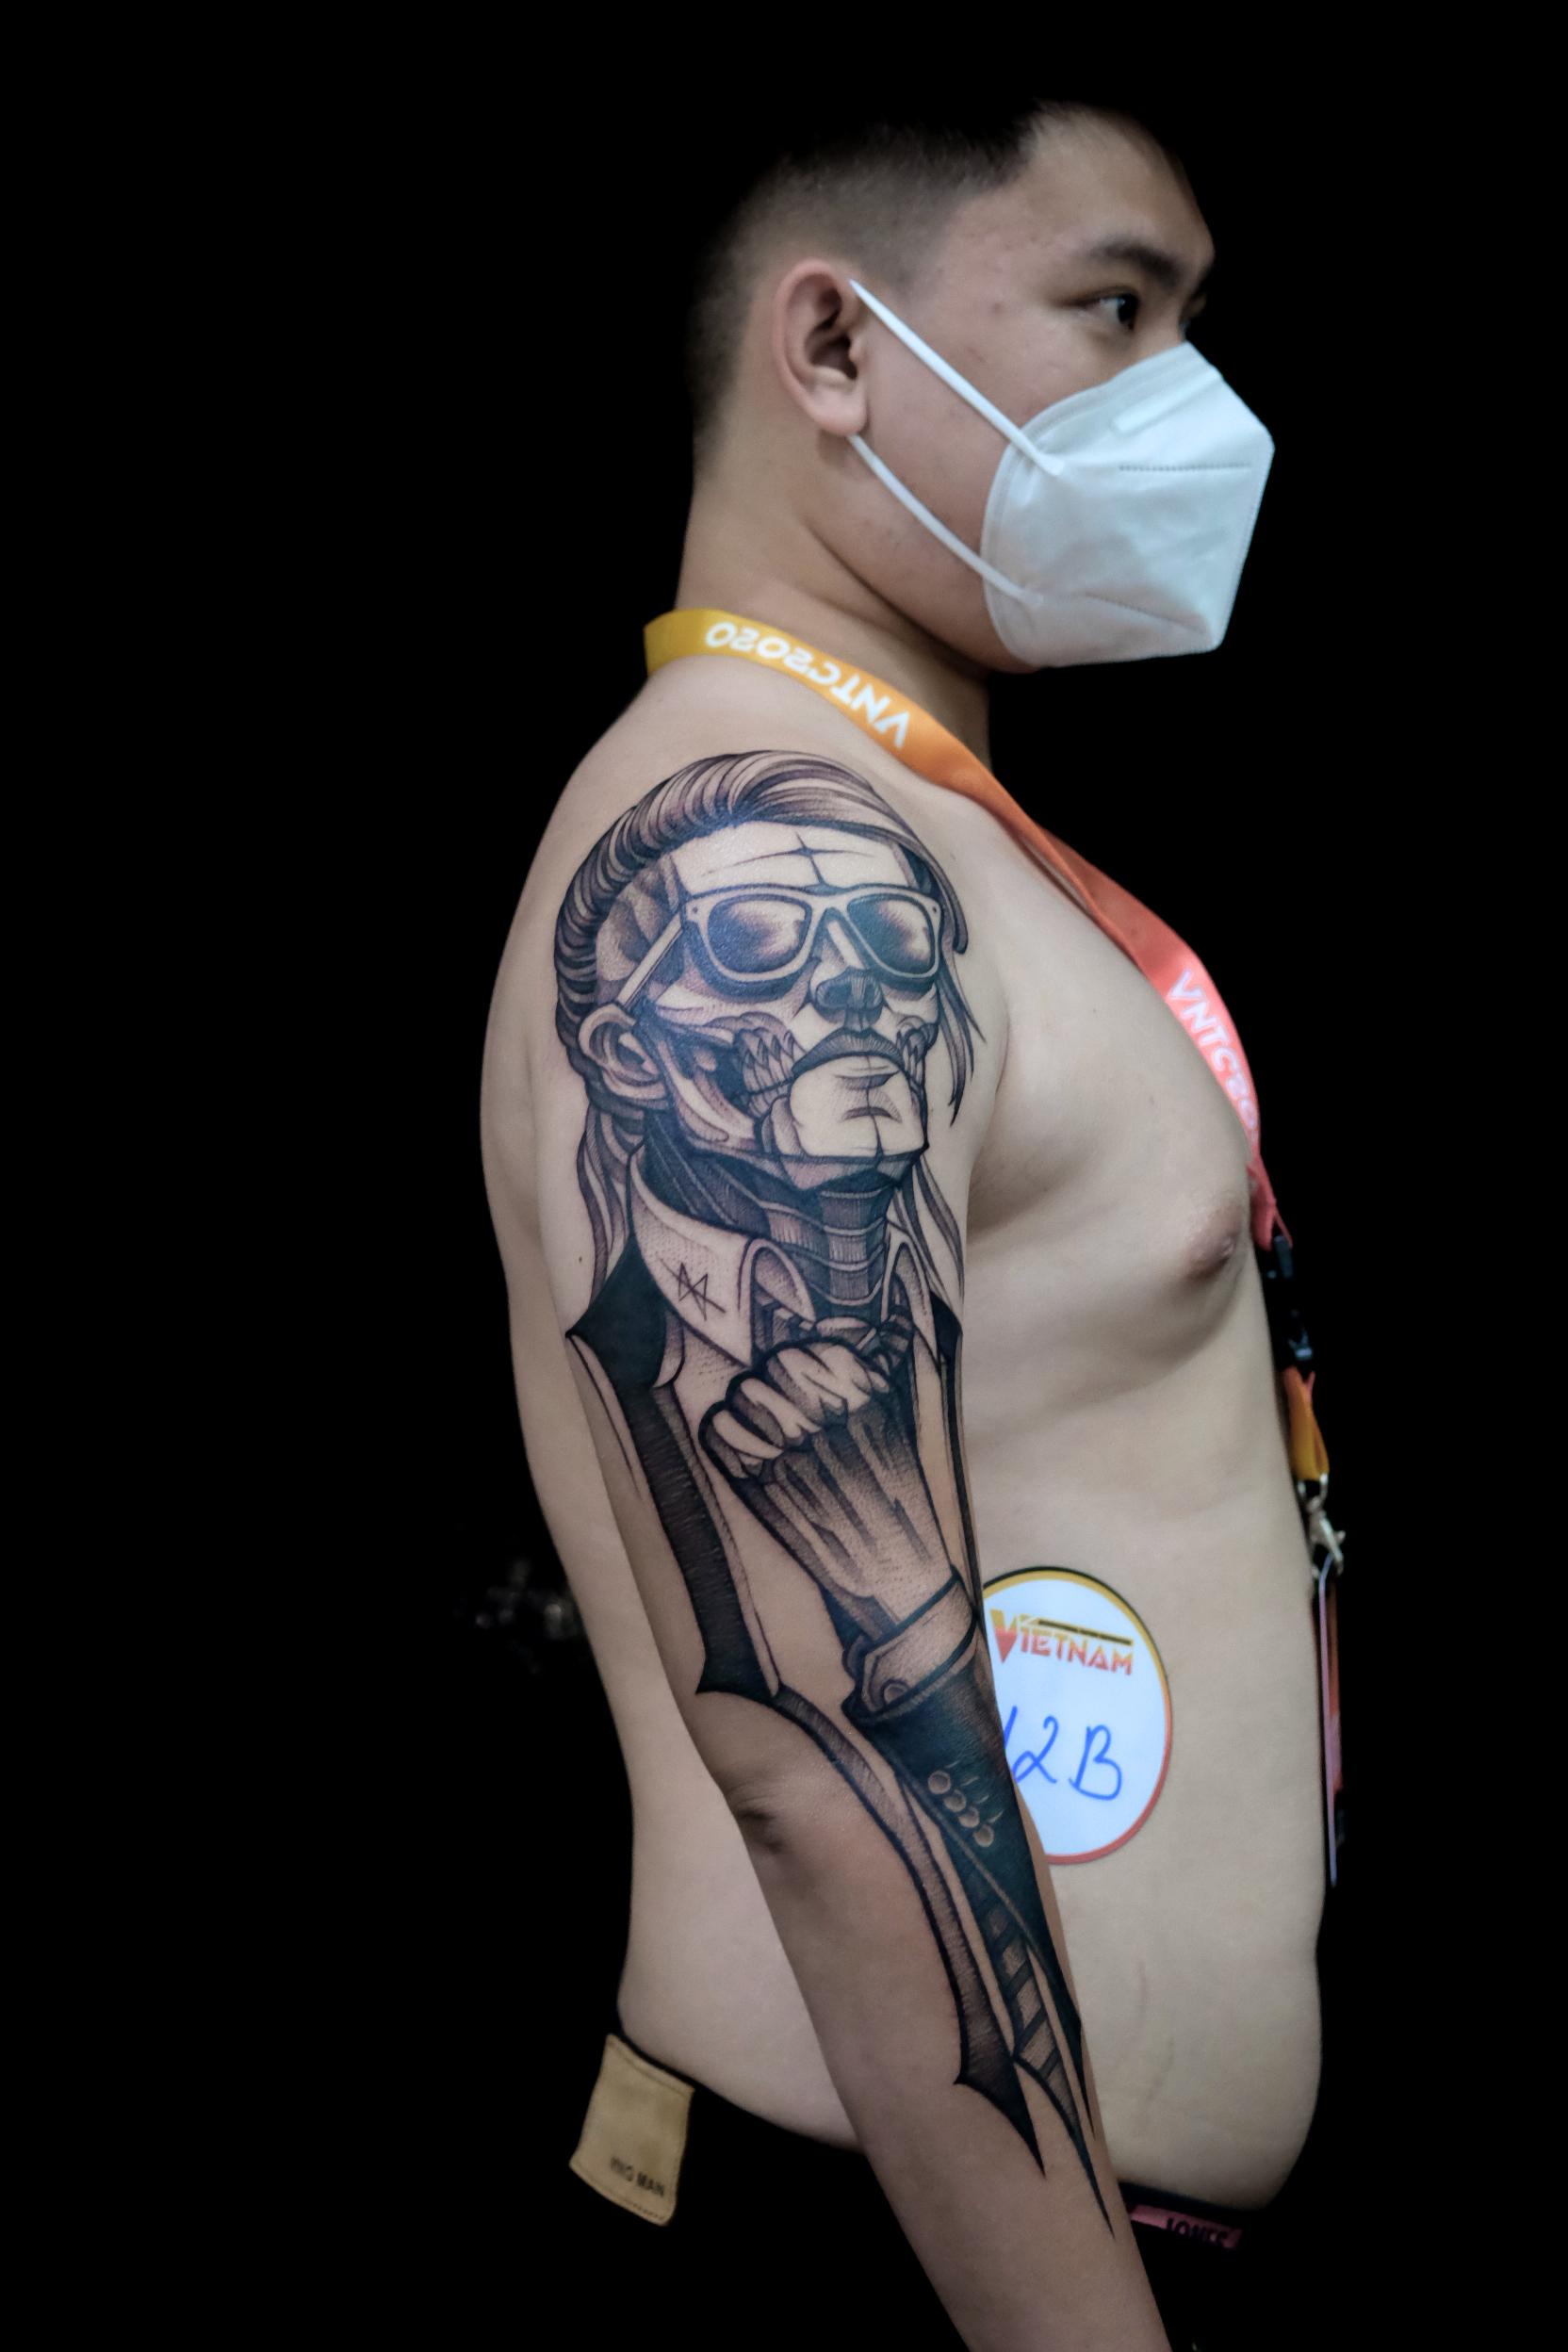 Giải Nhất Best Of The Day BlackWork tại VietNam Tattoo Convention 2020